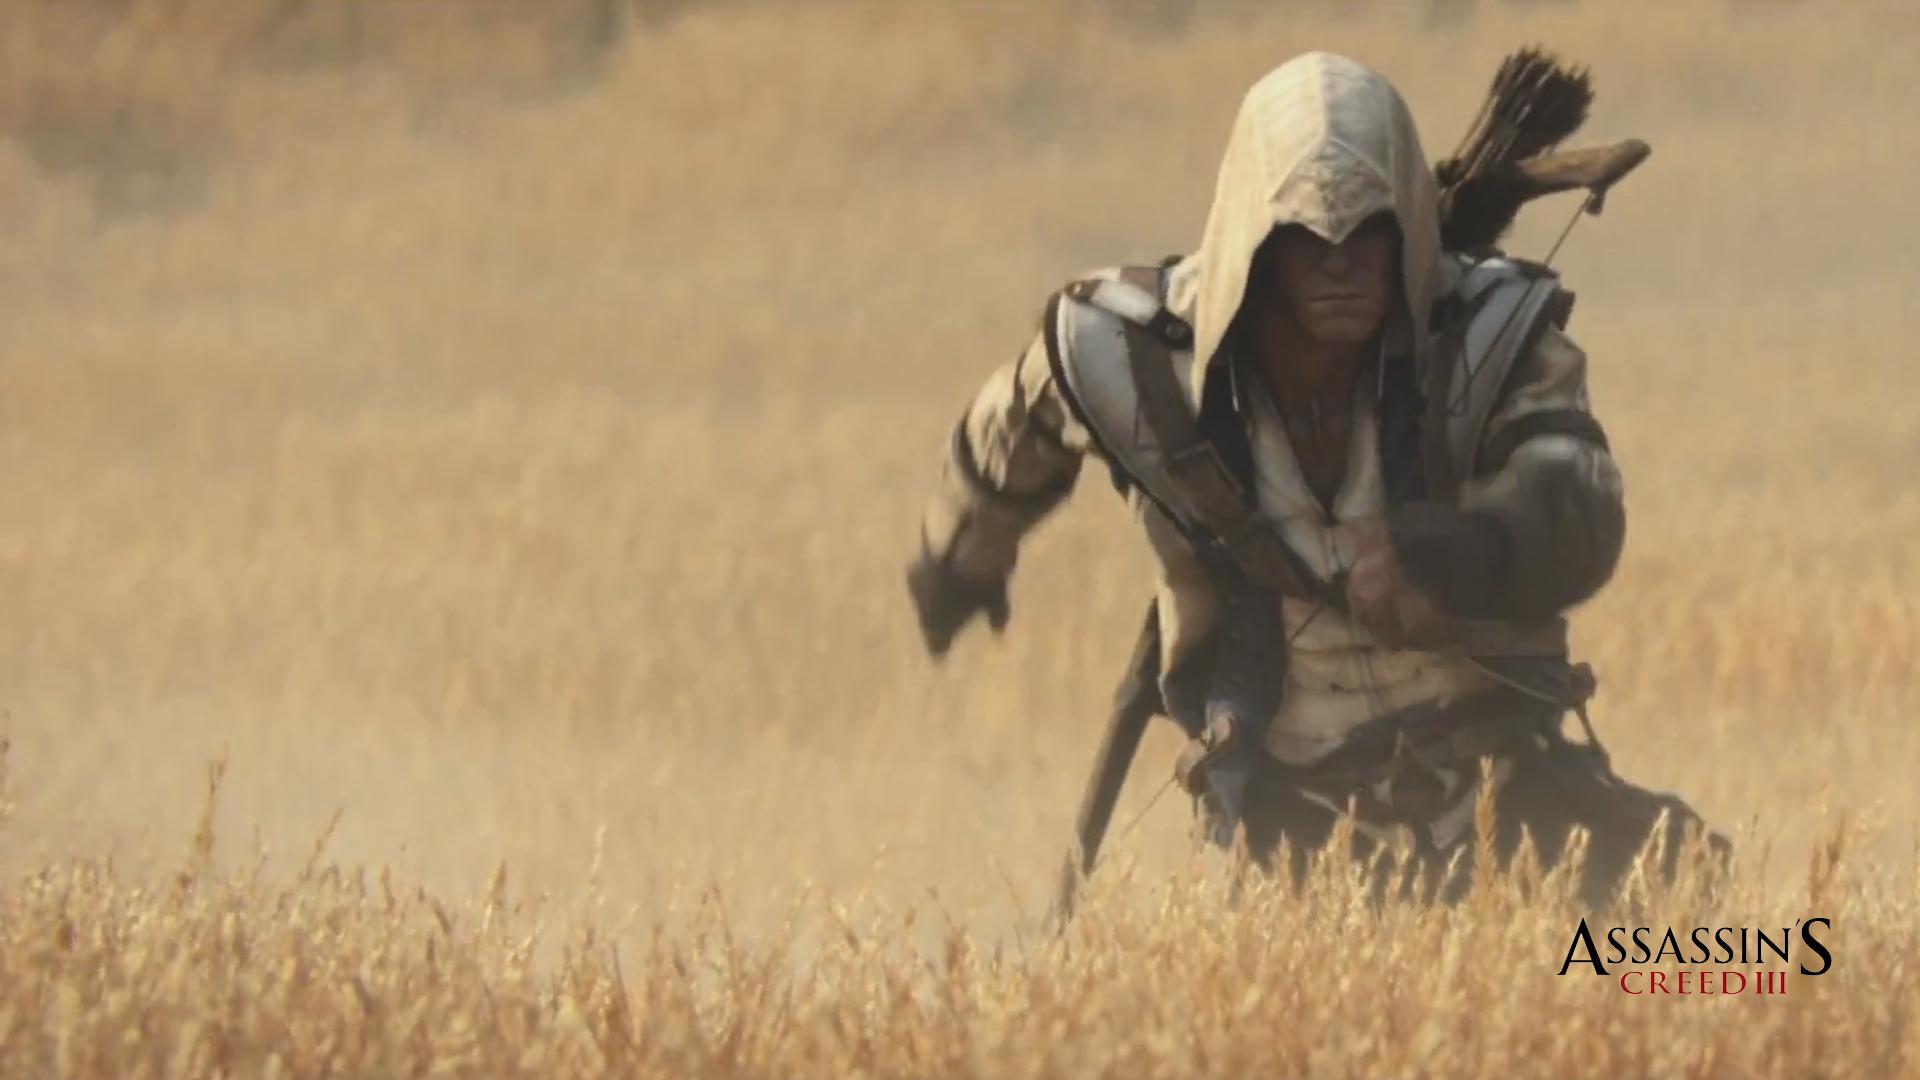 Assassins Creed III wallpaper Assassins Creed III wallpapers 1920x1080